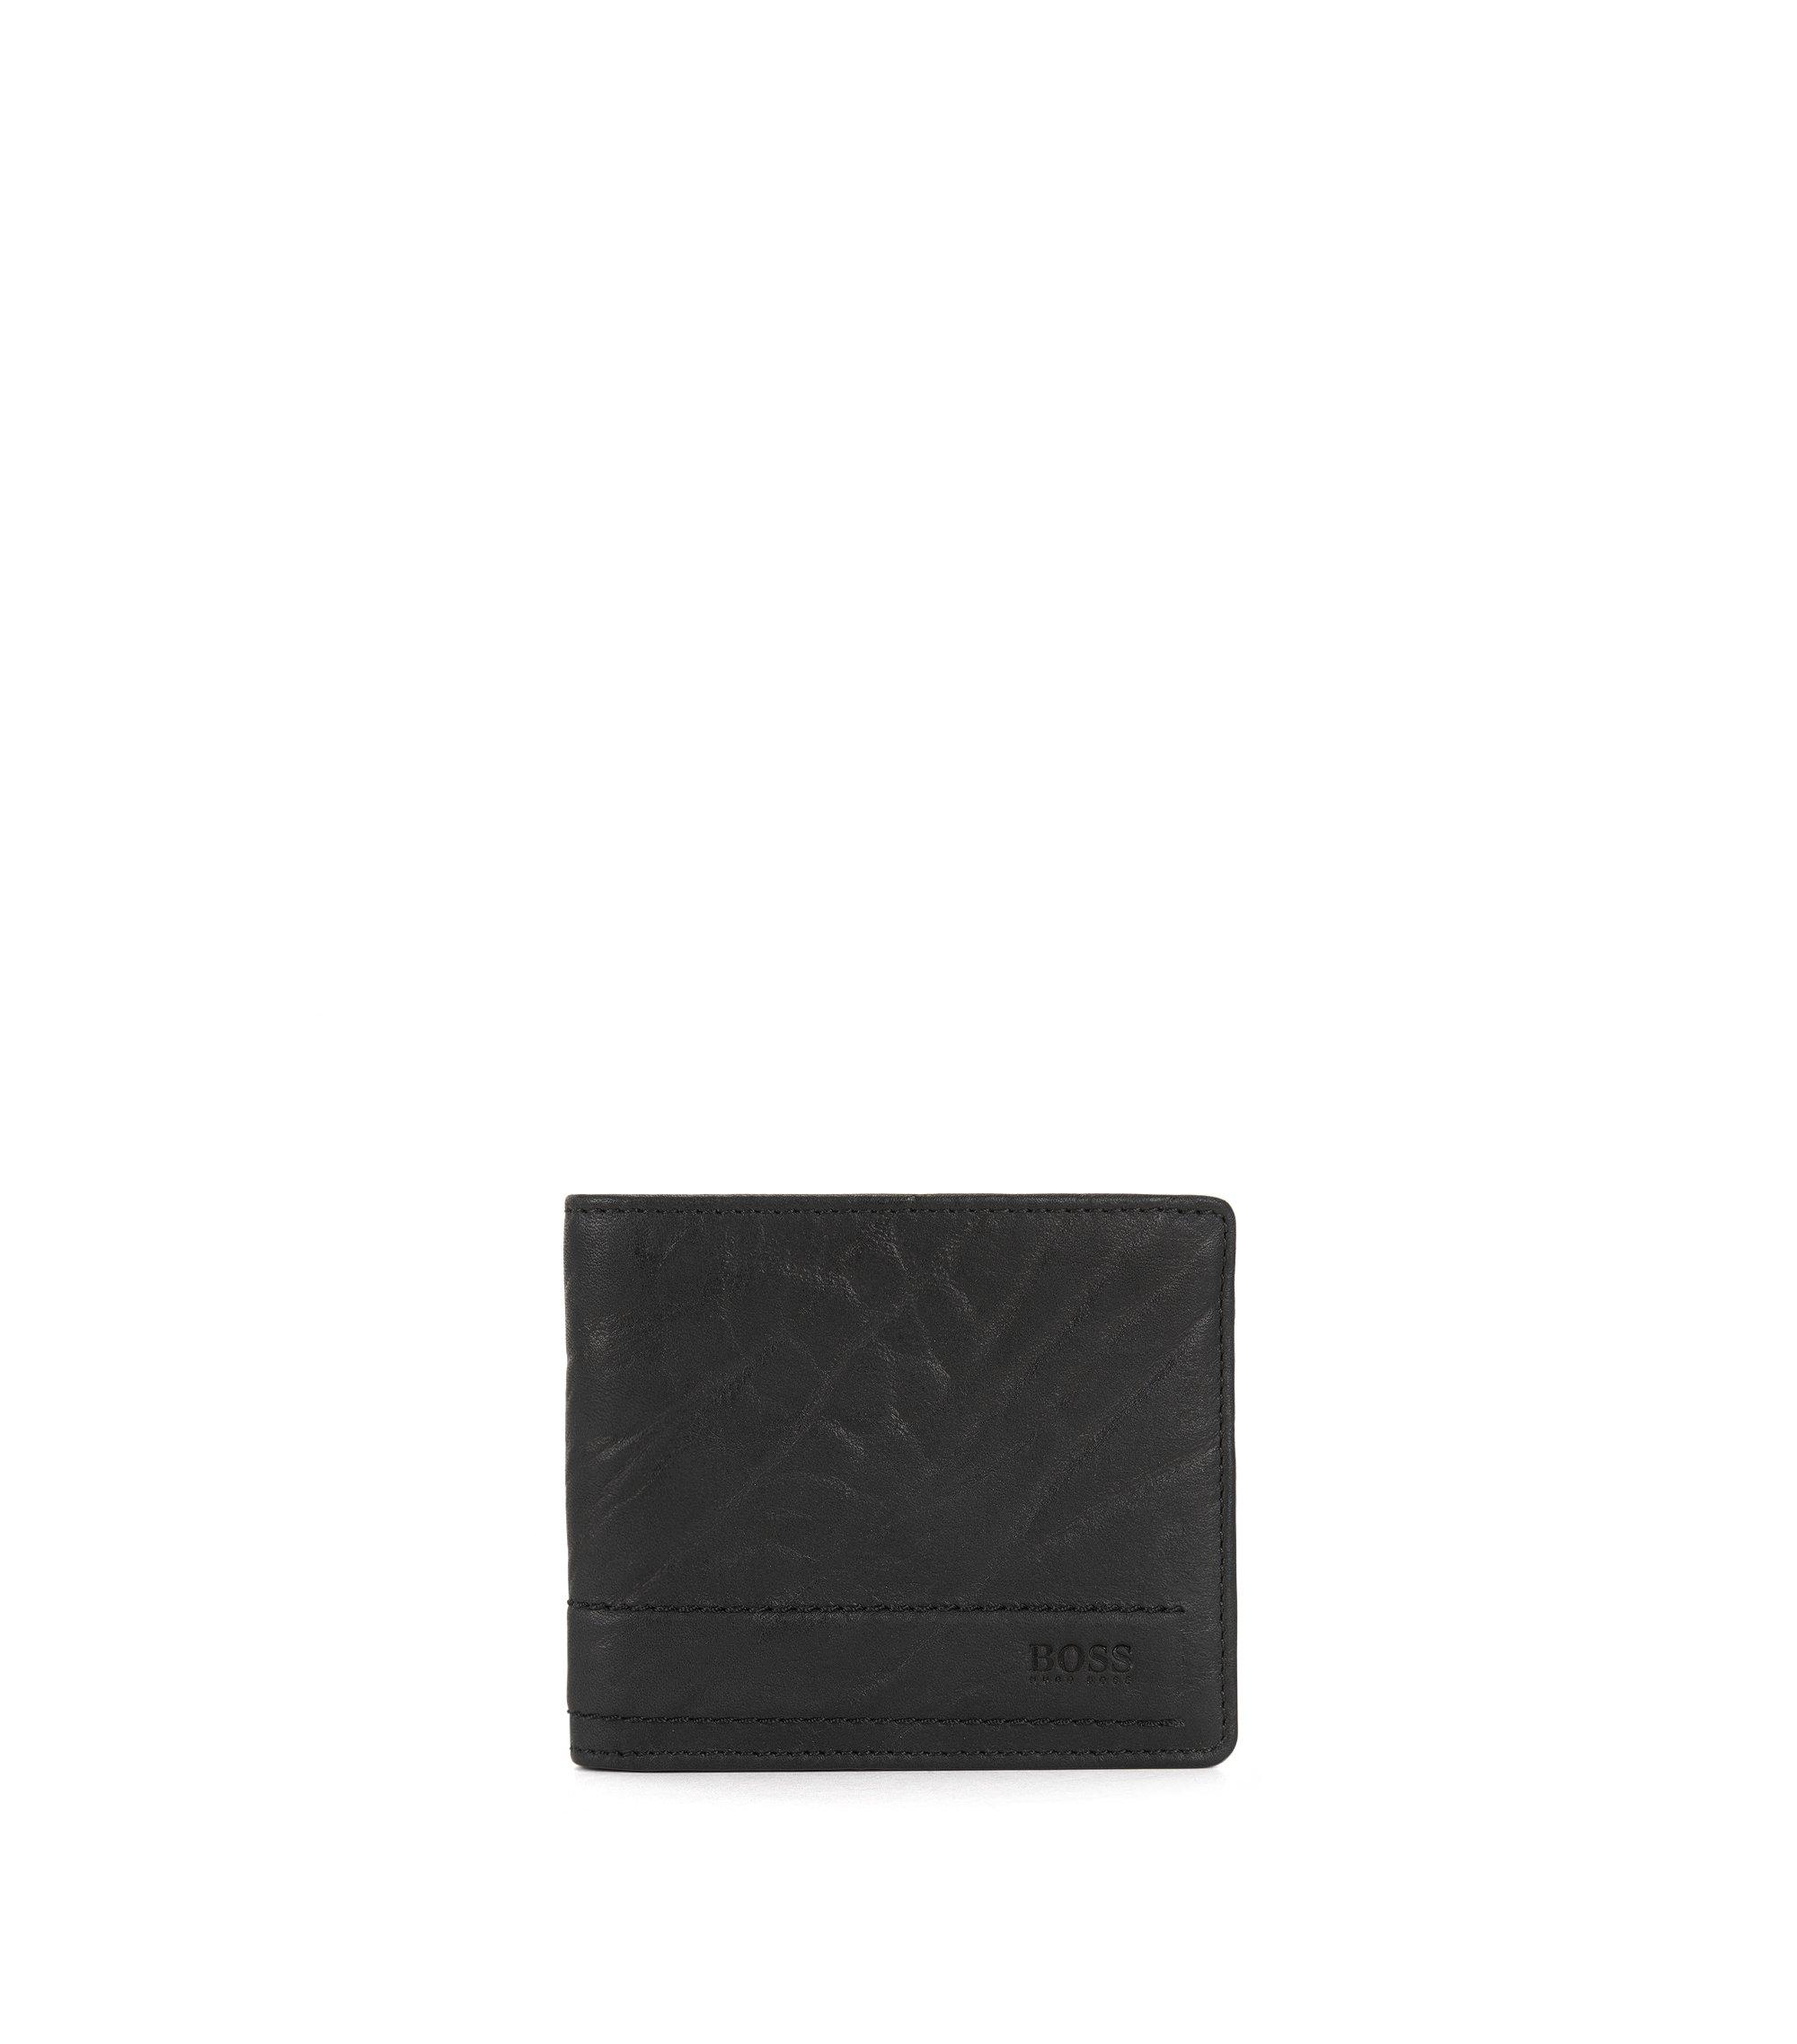 Klapp-Geldbörse aus genarbtem Leder, Schwarz